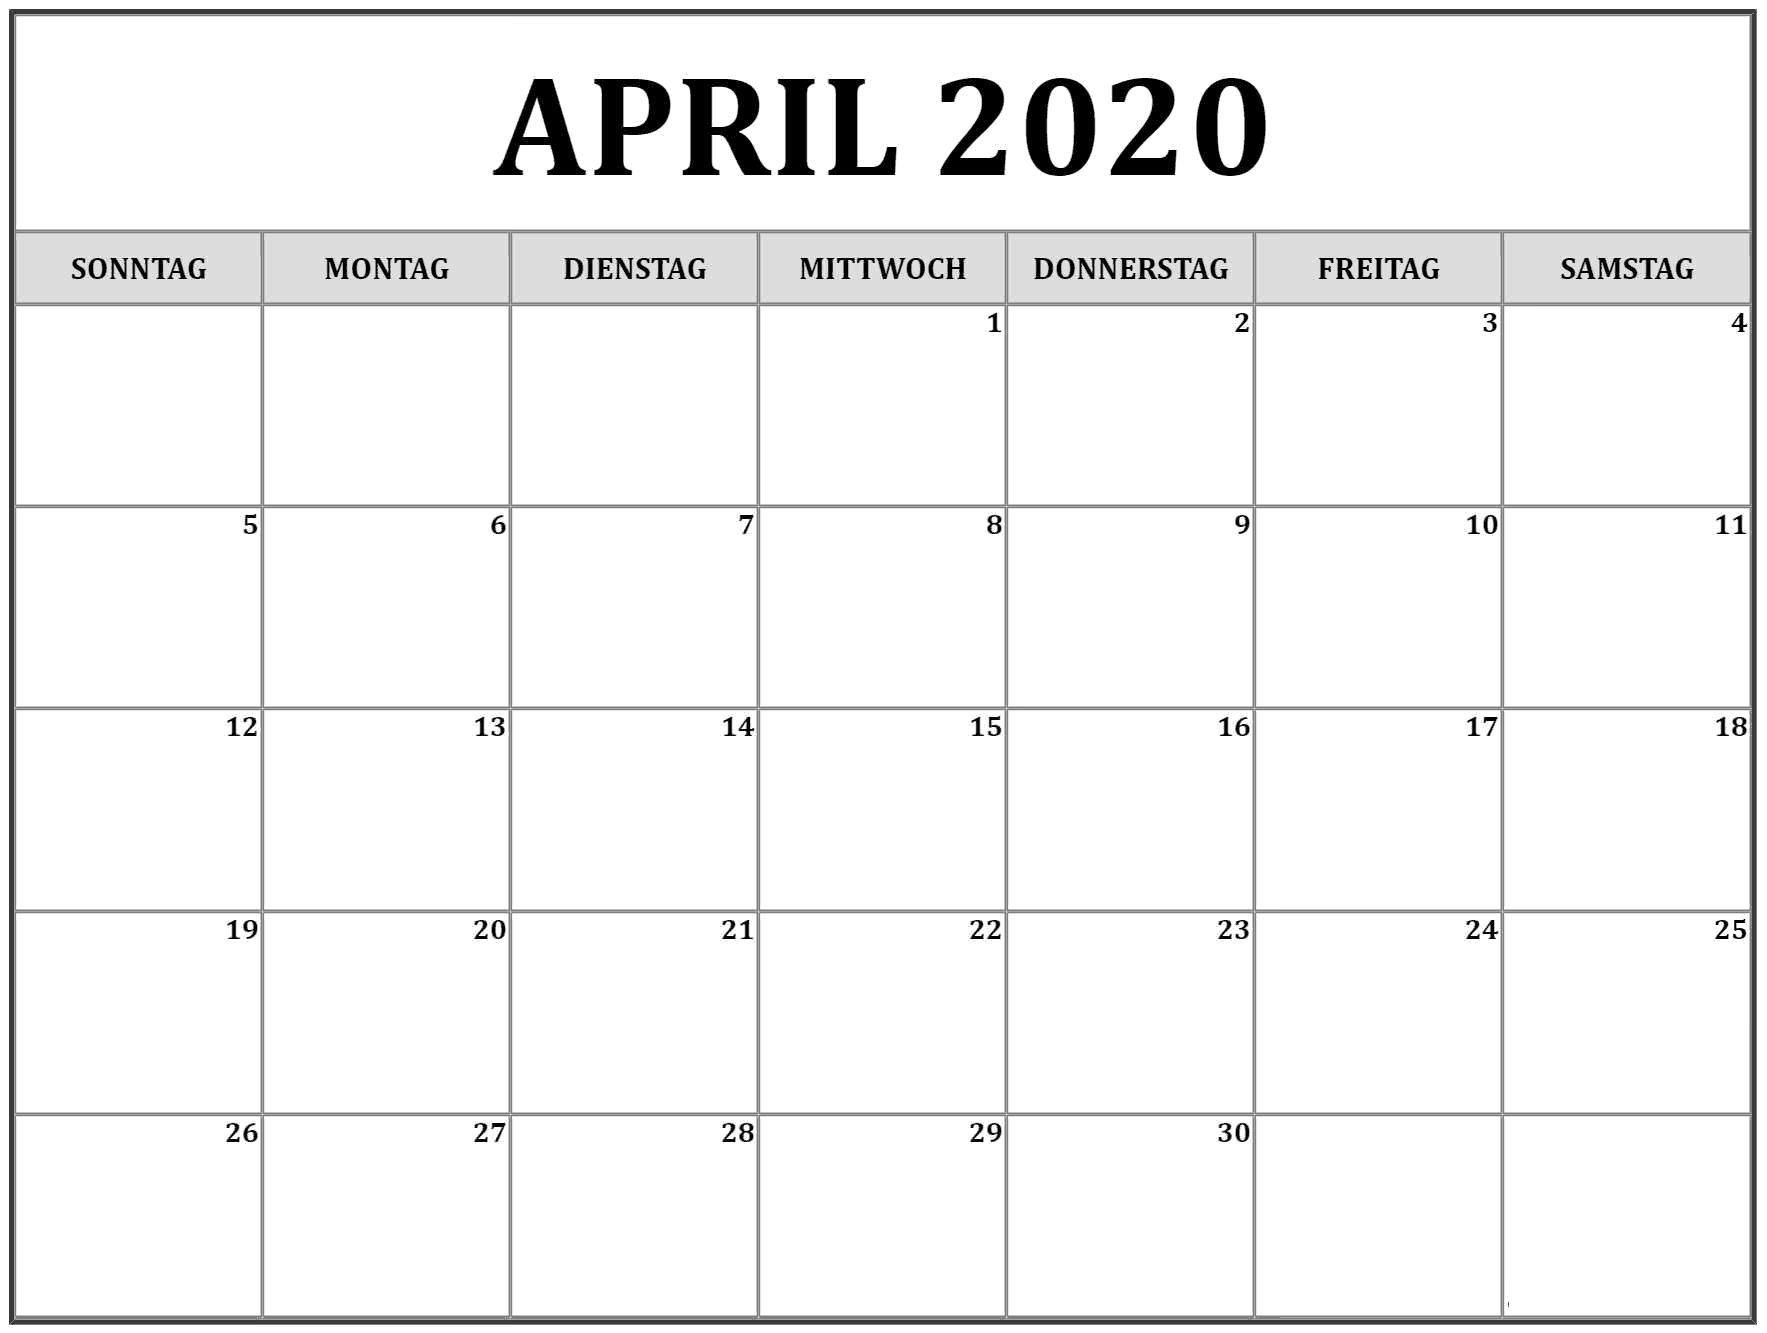 April 2020 kalender PNG